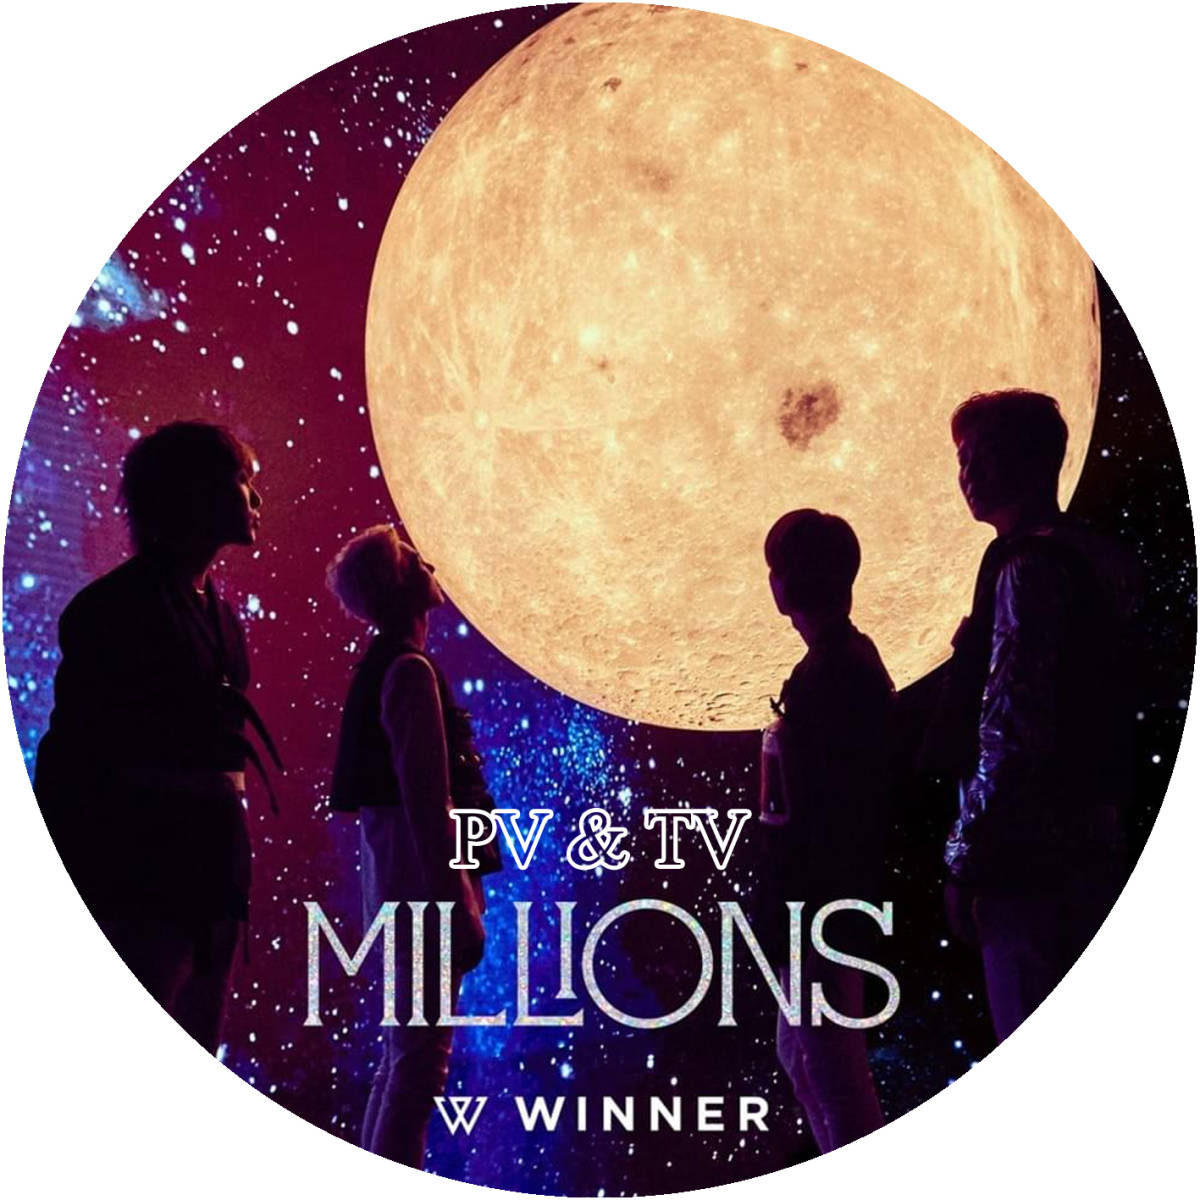 WINNER DVD WINNER [ MILLIONS ] PV & TV DVDレ―ベル印刷 字幕無し